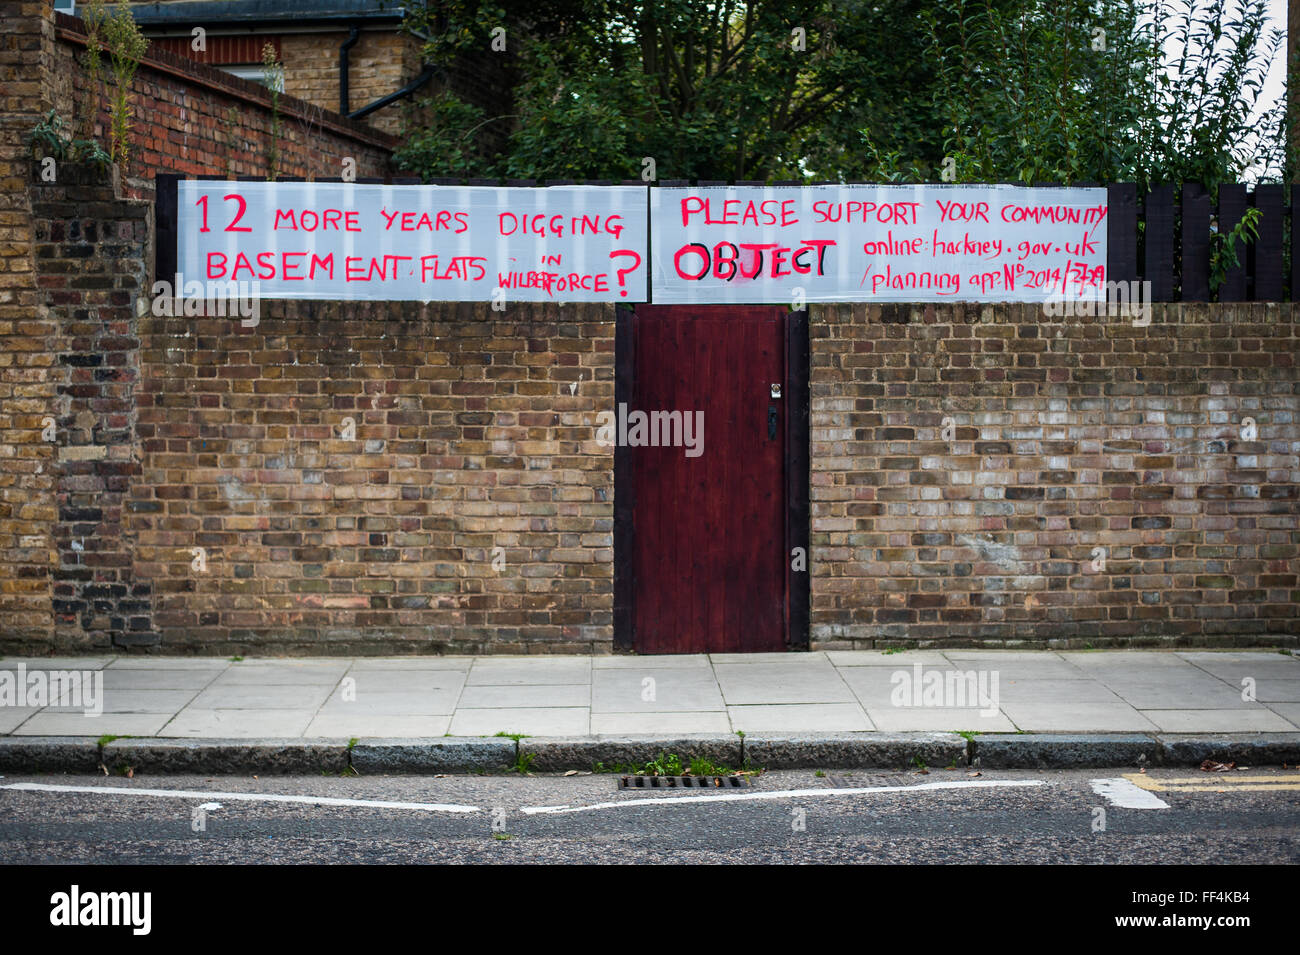 Neighbourhood objection to the construction of basement flats, Finsbury Park, London - Stock Image